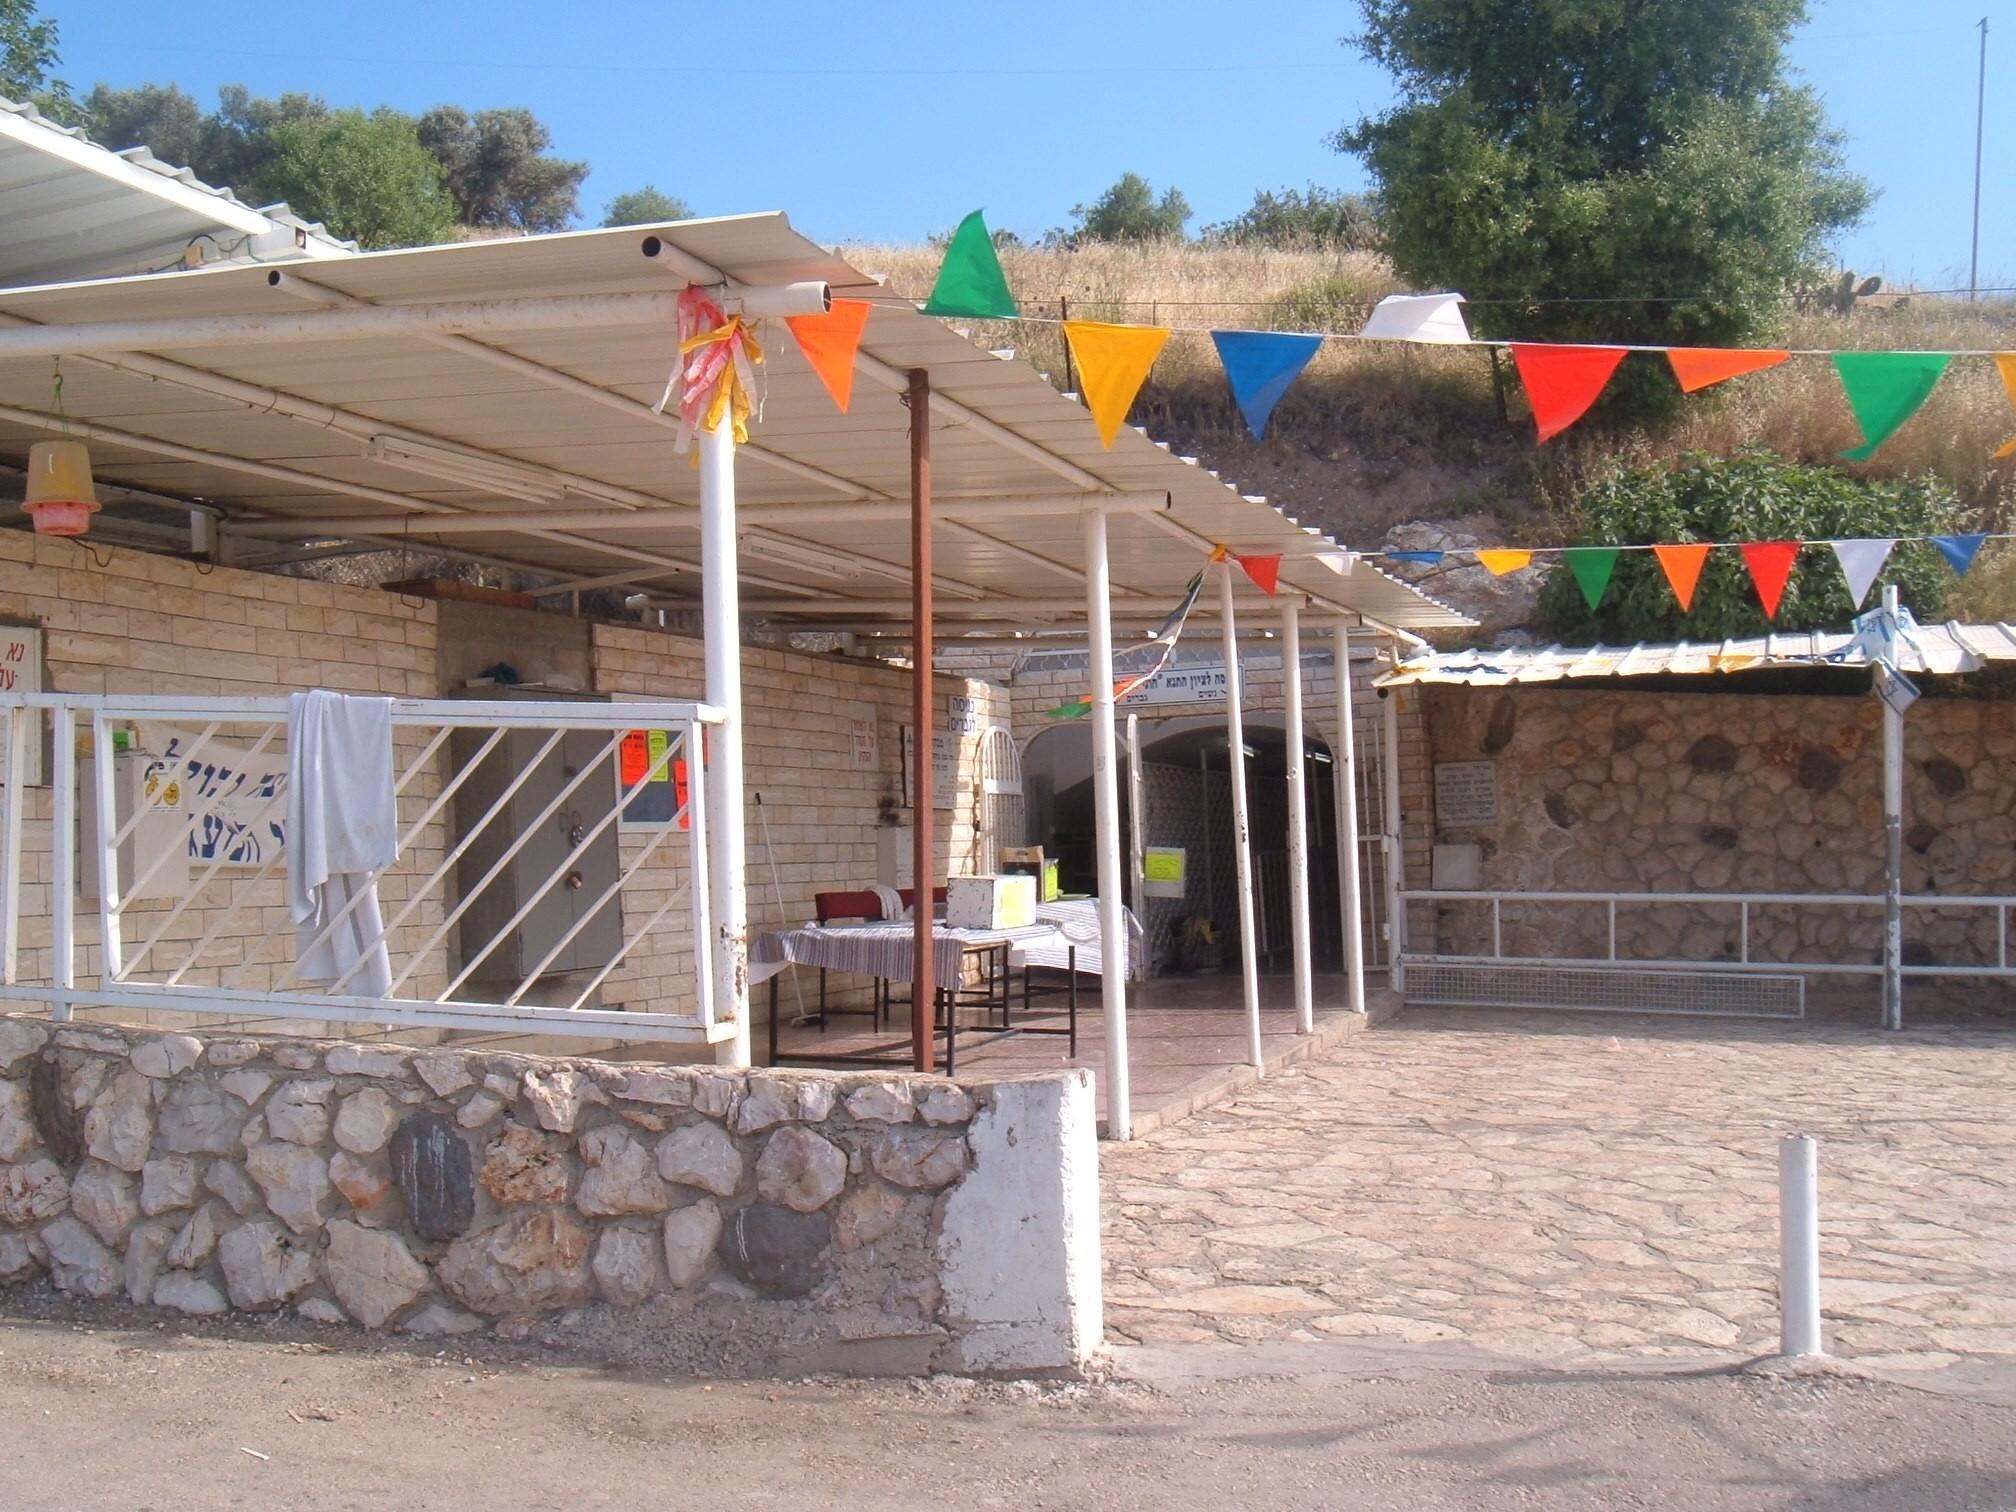 Honi hameagel tomb